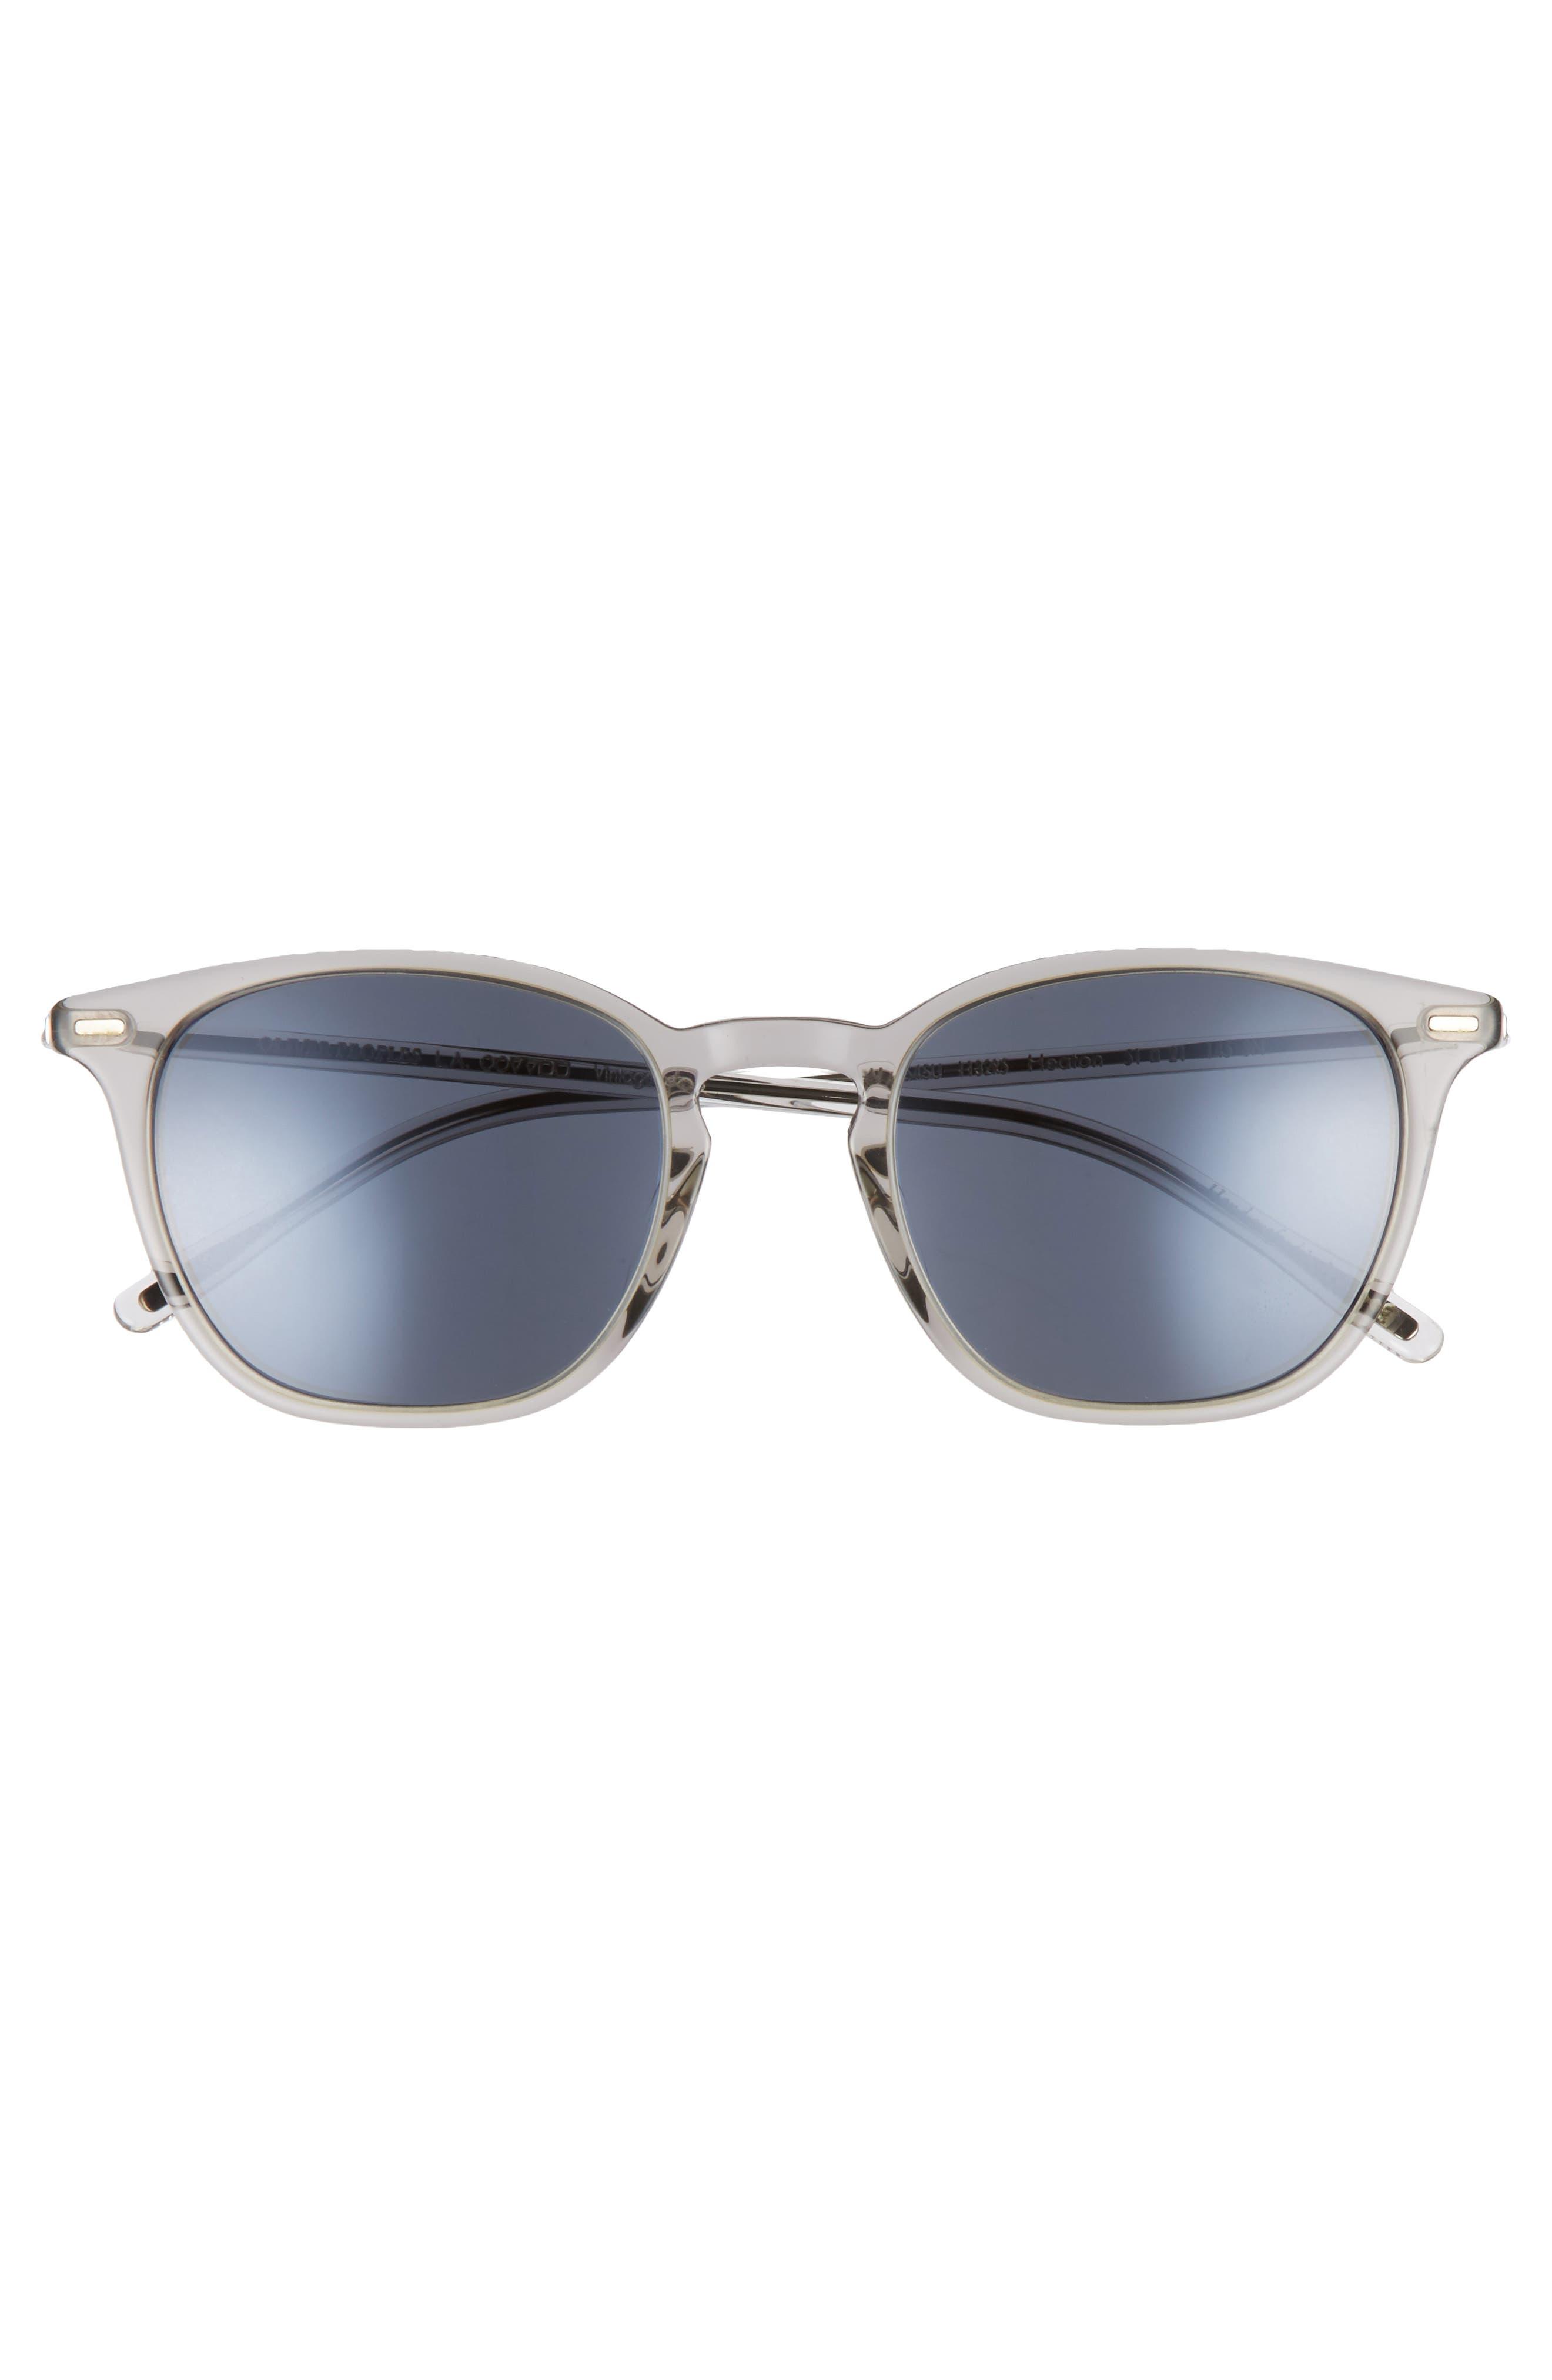 OLIVER PEOPLES,                             Heaton 51mm Sunglasses,                             Alternate thumbnail 2, color,                             022